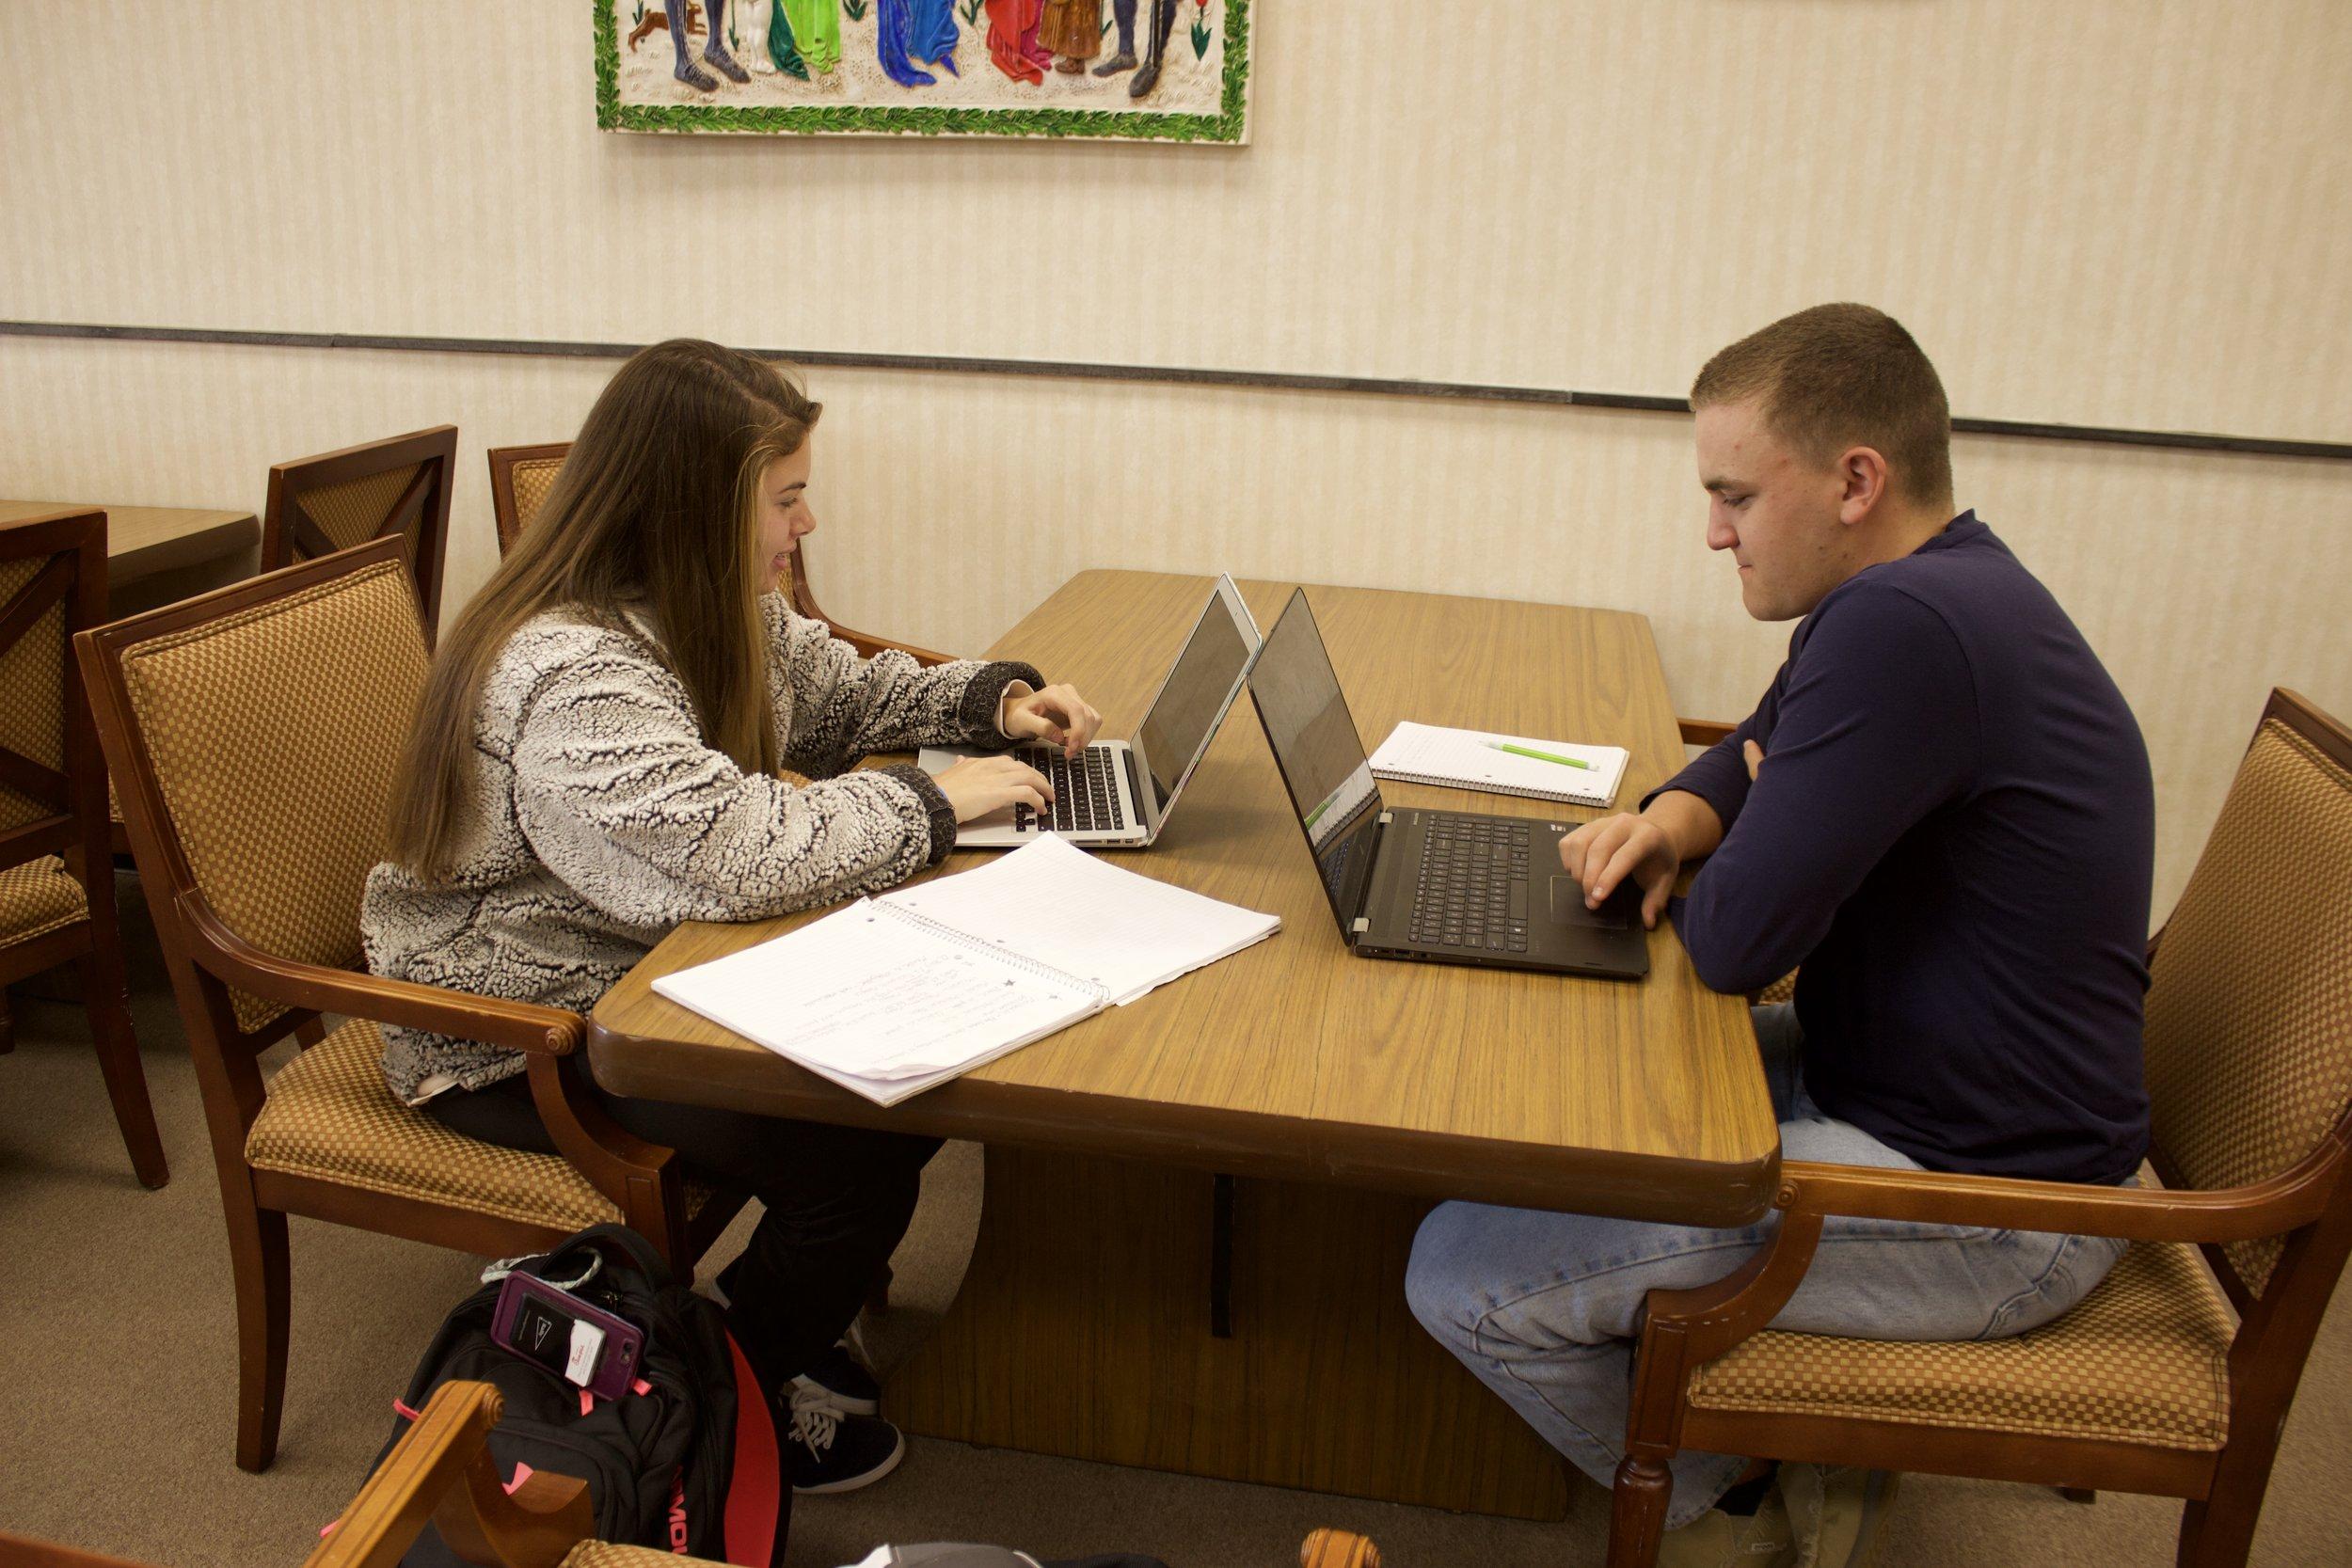 Kristen Emery and Harrison Blake Carraher work on homework in the library.